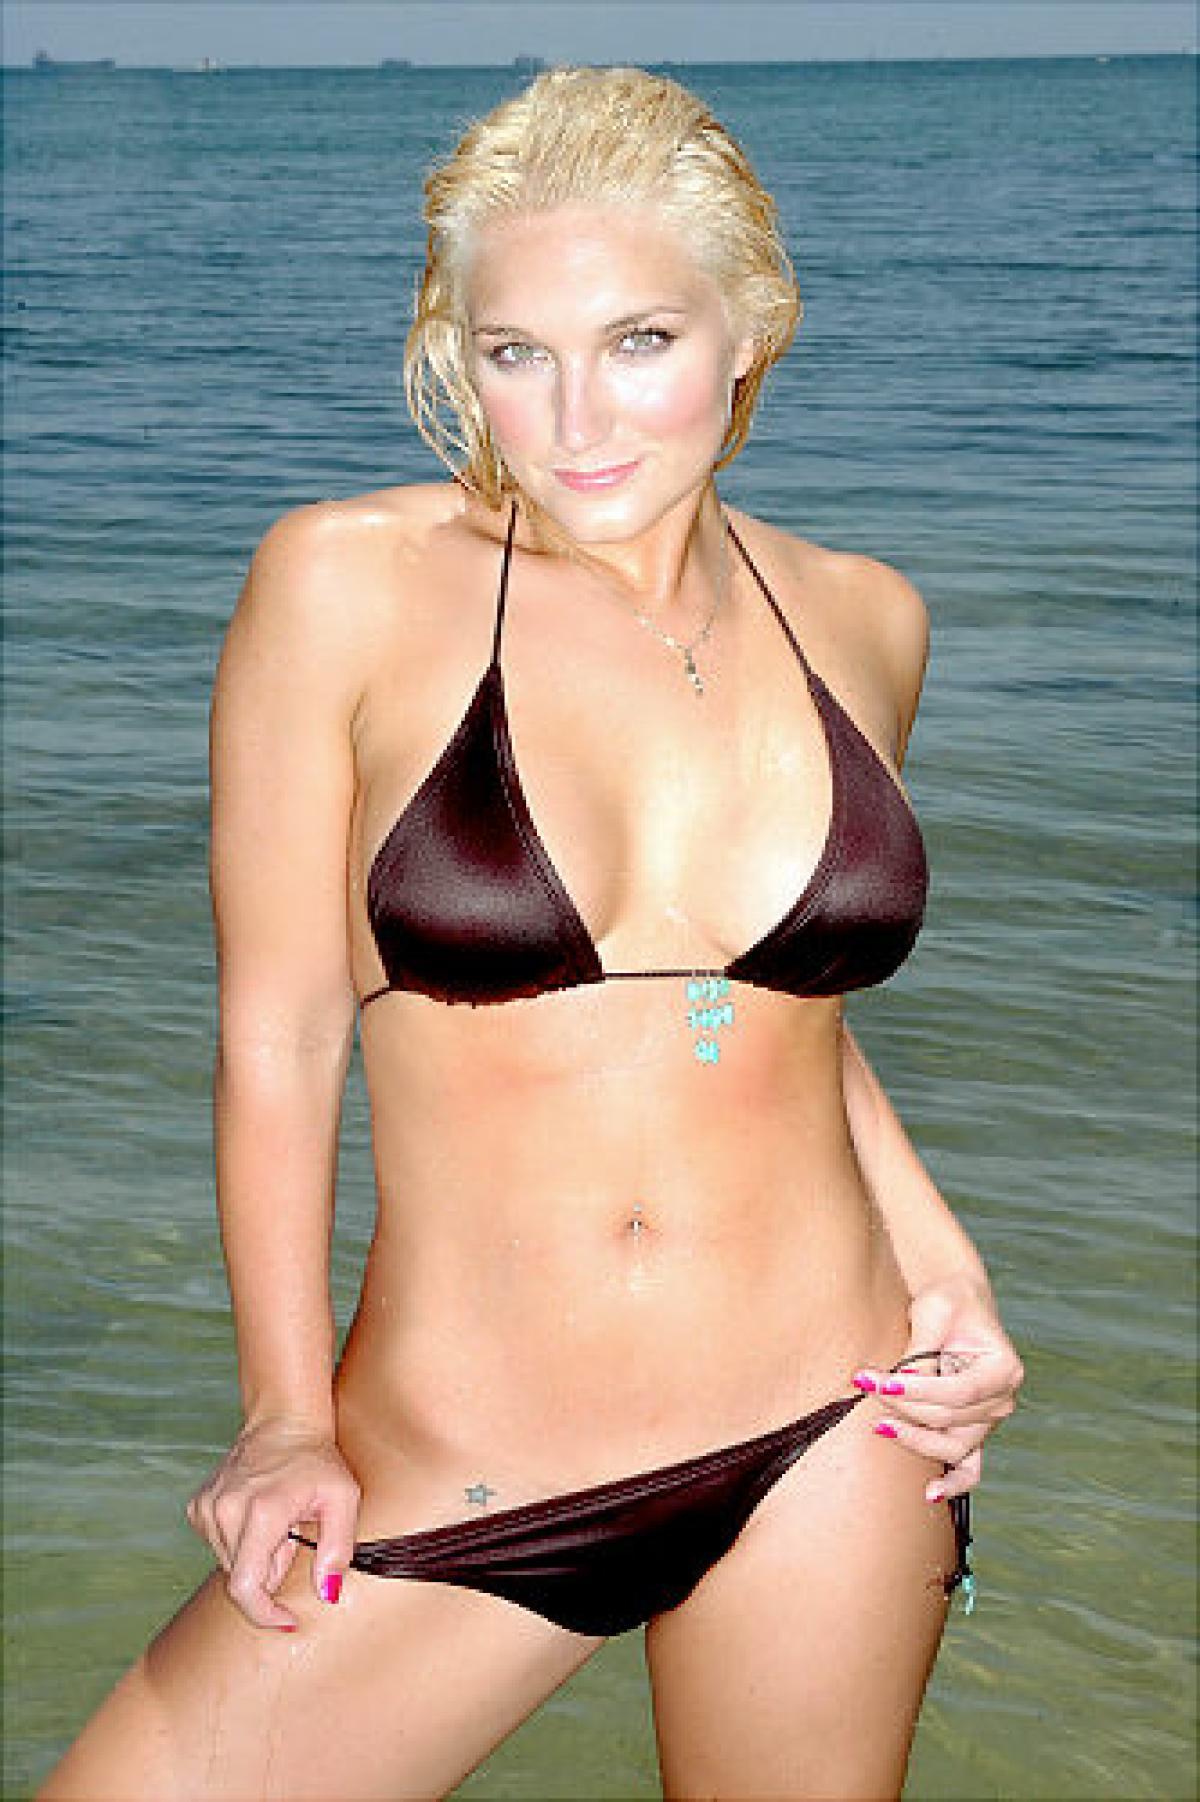 Happy Birthday Brooke Hogan!